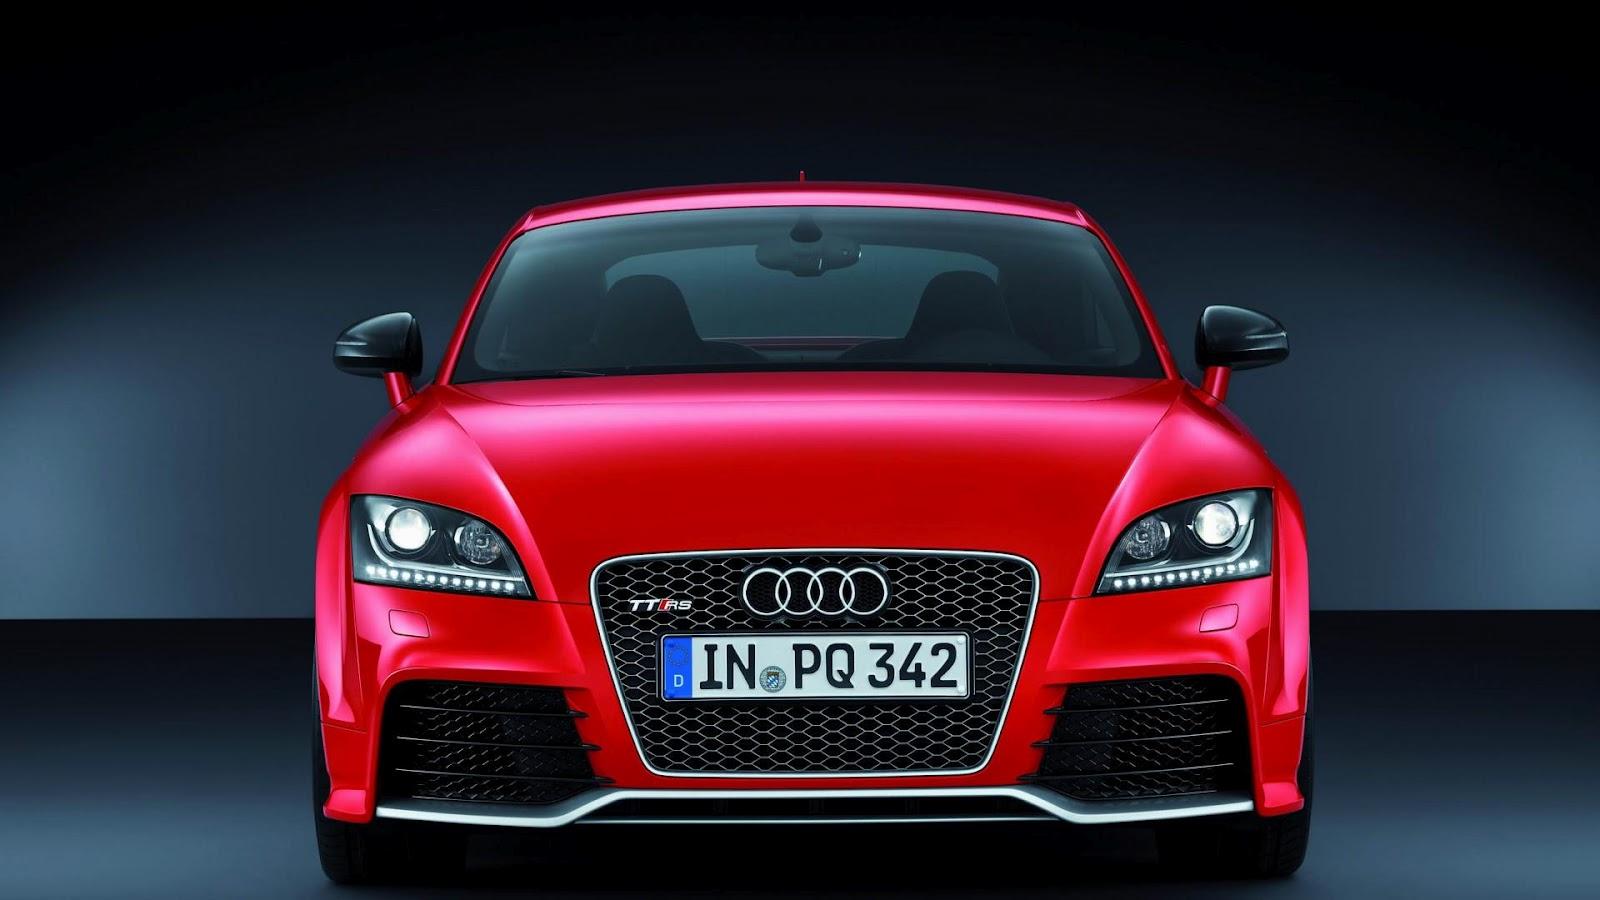 http://2.bp.blogspot.com/-iVz8TwIzBnI/UDzK4TiMNwI/AAAAAAAAAWI/U5fLAnIEepc/s1600/Audi-TT-RS.jpg